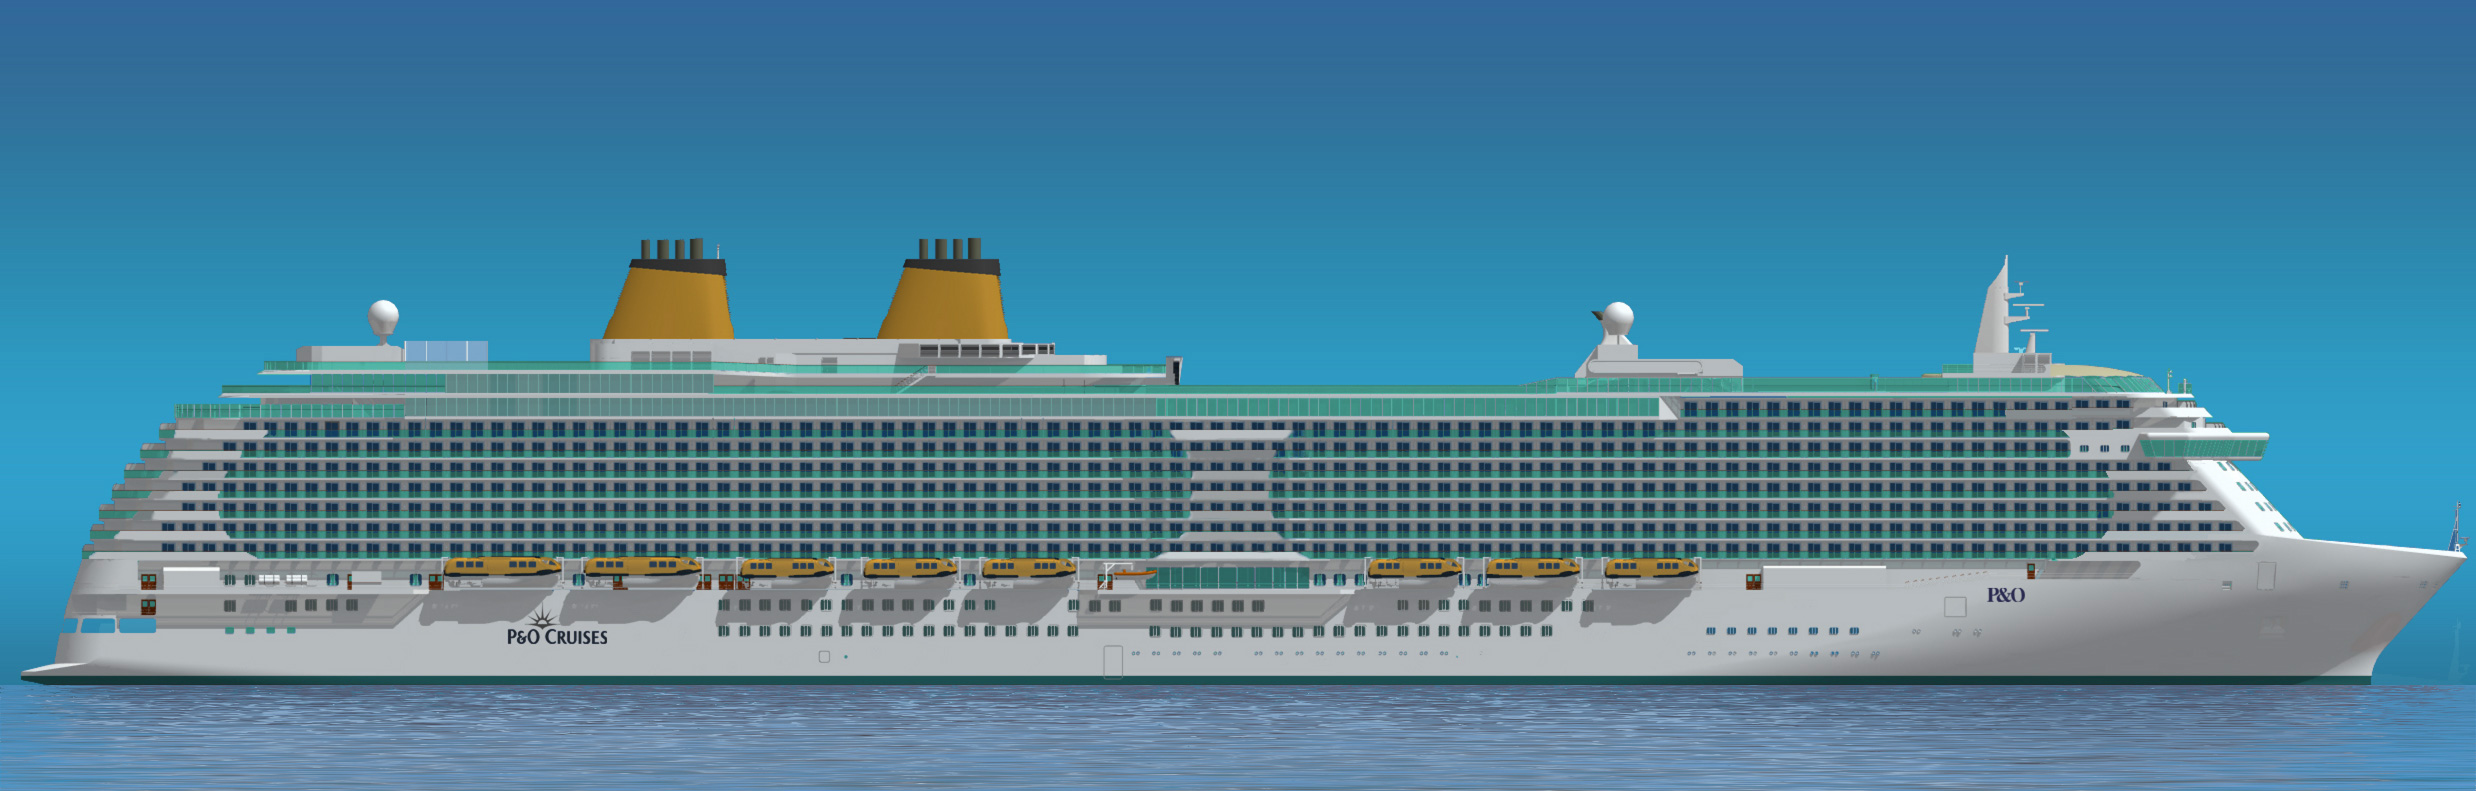 carnival cruise ship diagram venn of diabetes type 1 and 2